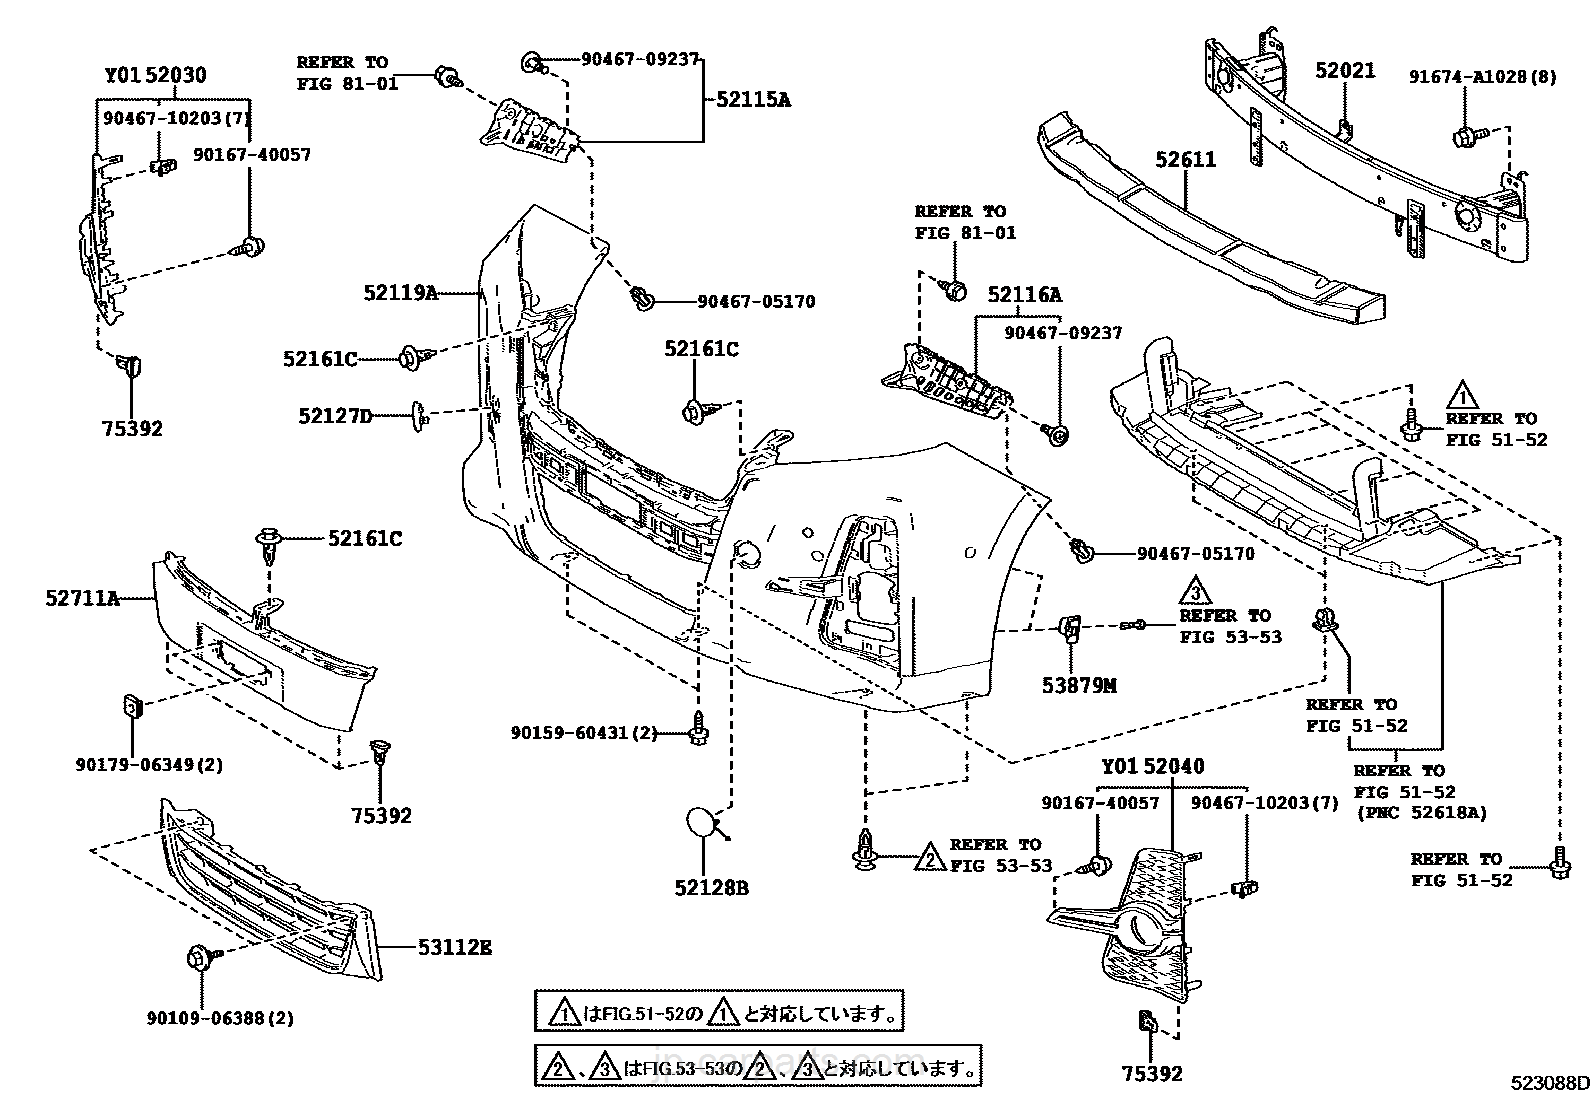 Set radhausschale delantero para toyota a53876-05031 53876-05030 a53875-05041